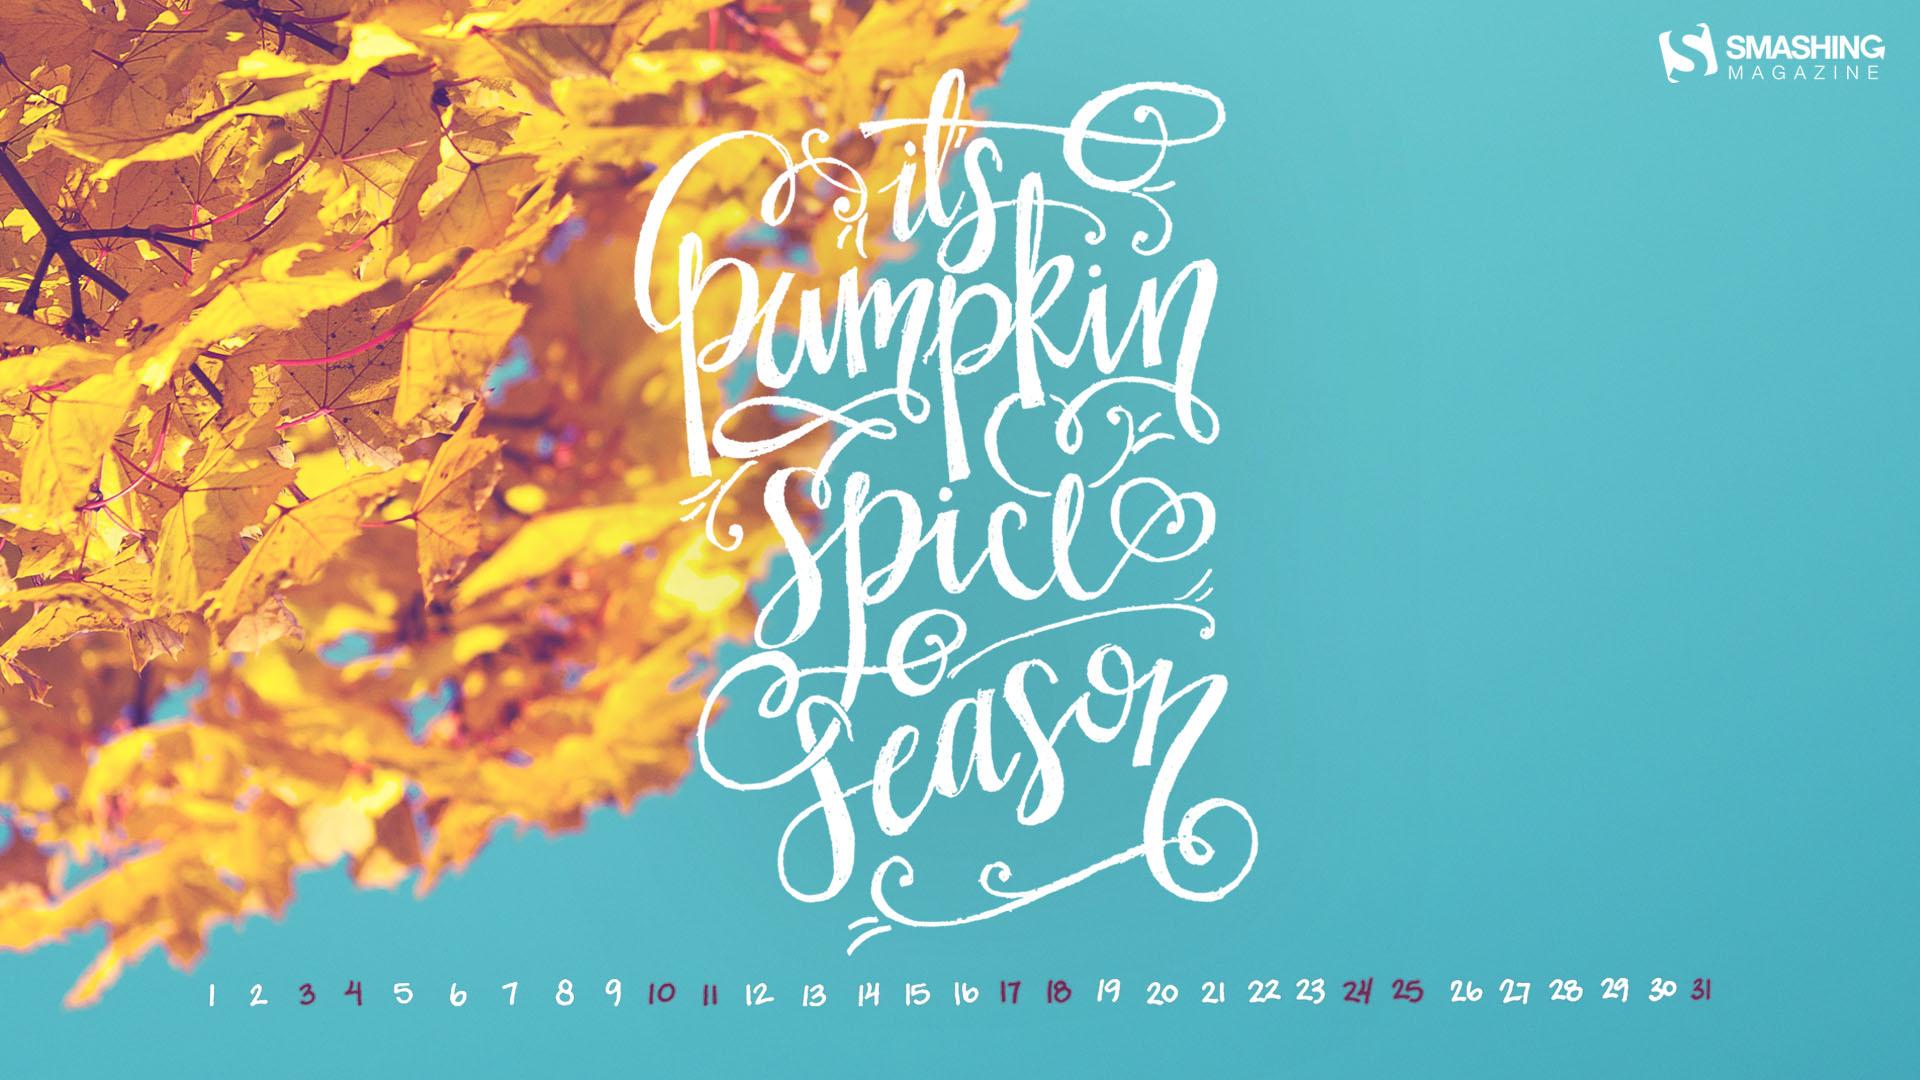 Basic October Desktop Calendars Wallpapers October 2015 1920x1080